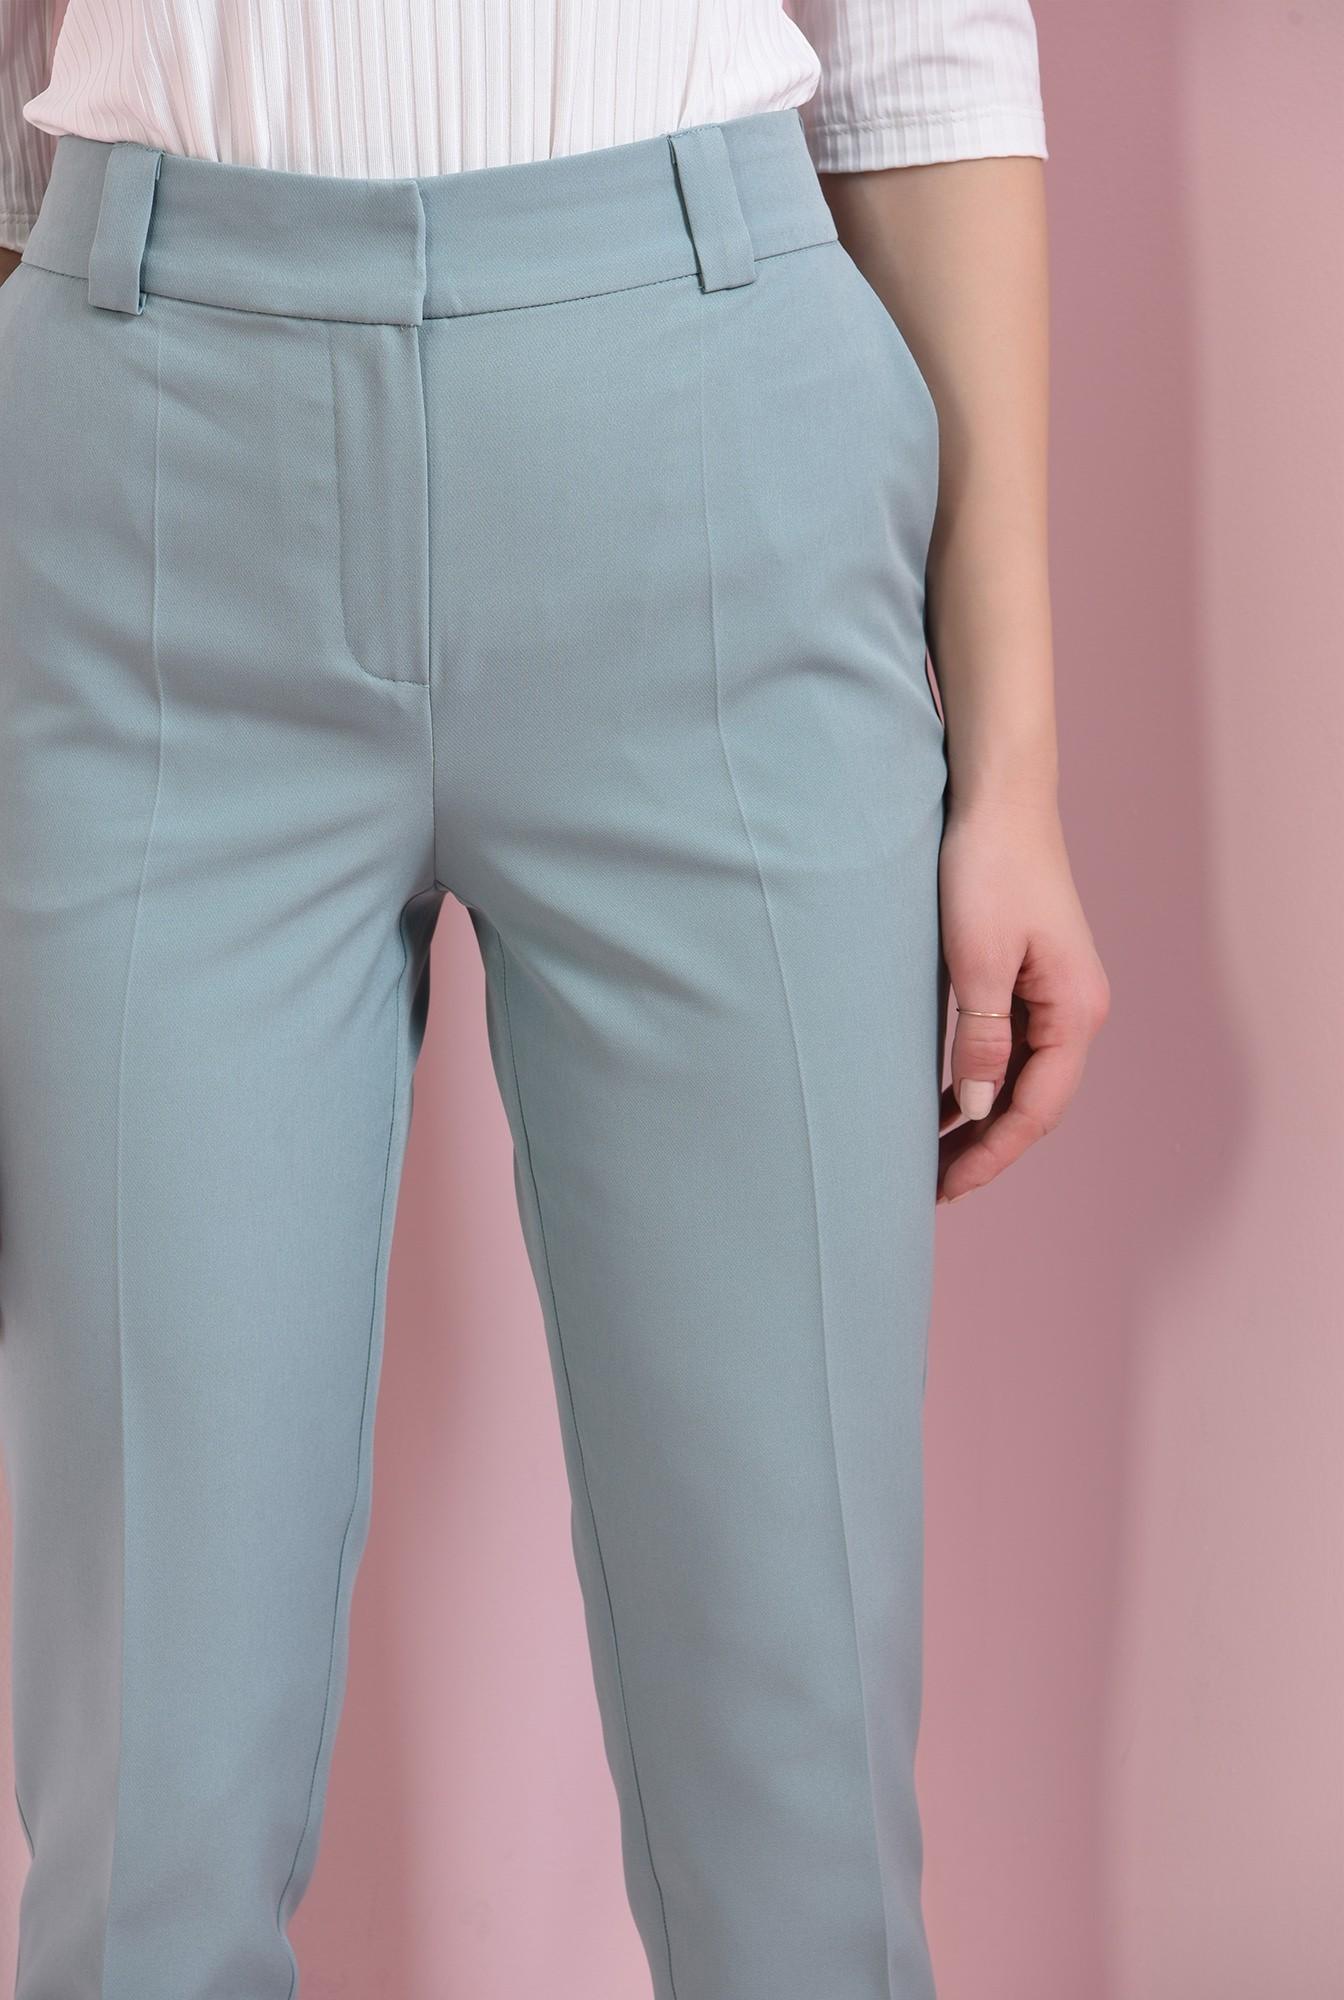 2 - pantaloni menta, conici, Poema